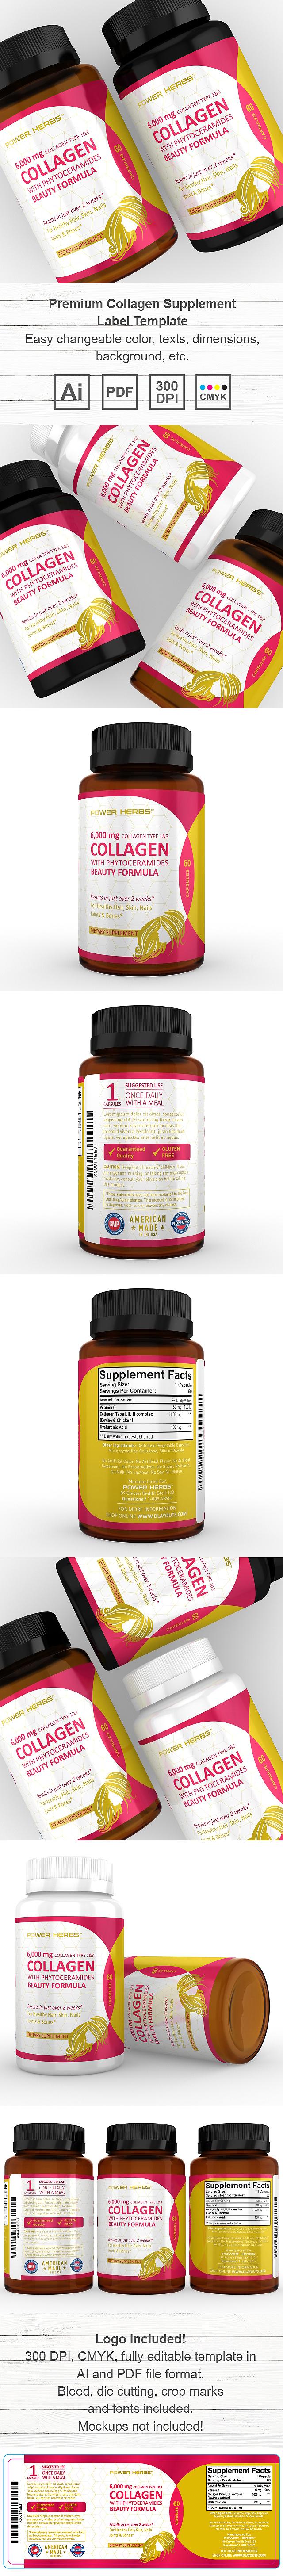 Premium Collagen Supplement Label Template